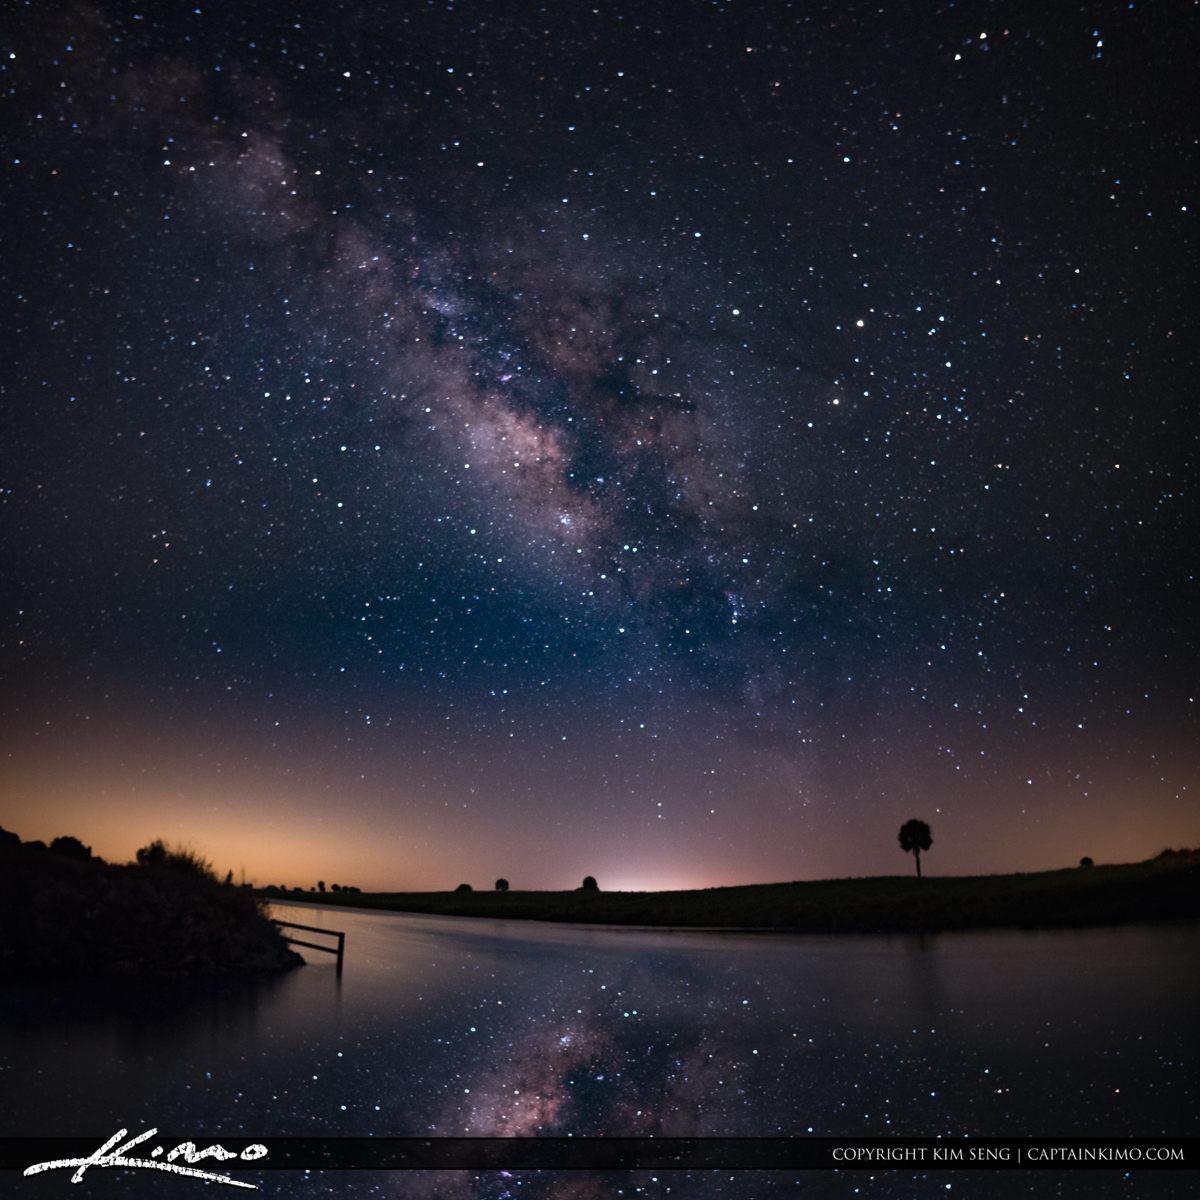 Milkyway Over West Okeechobee Florida at Small Lake